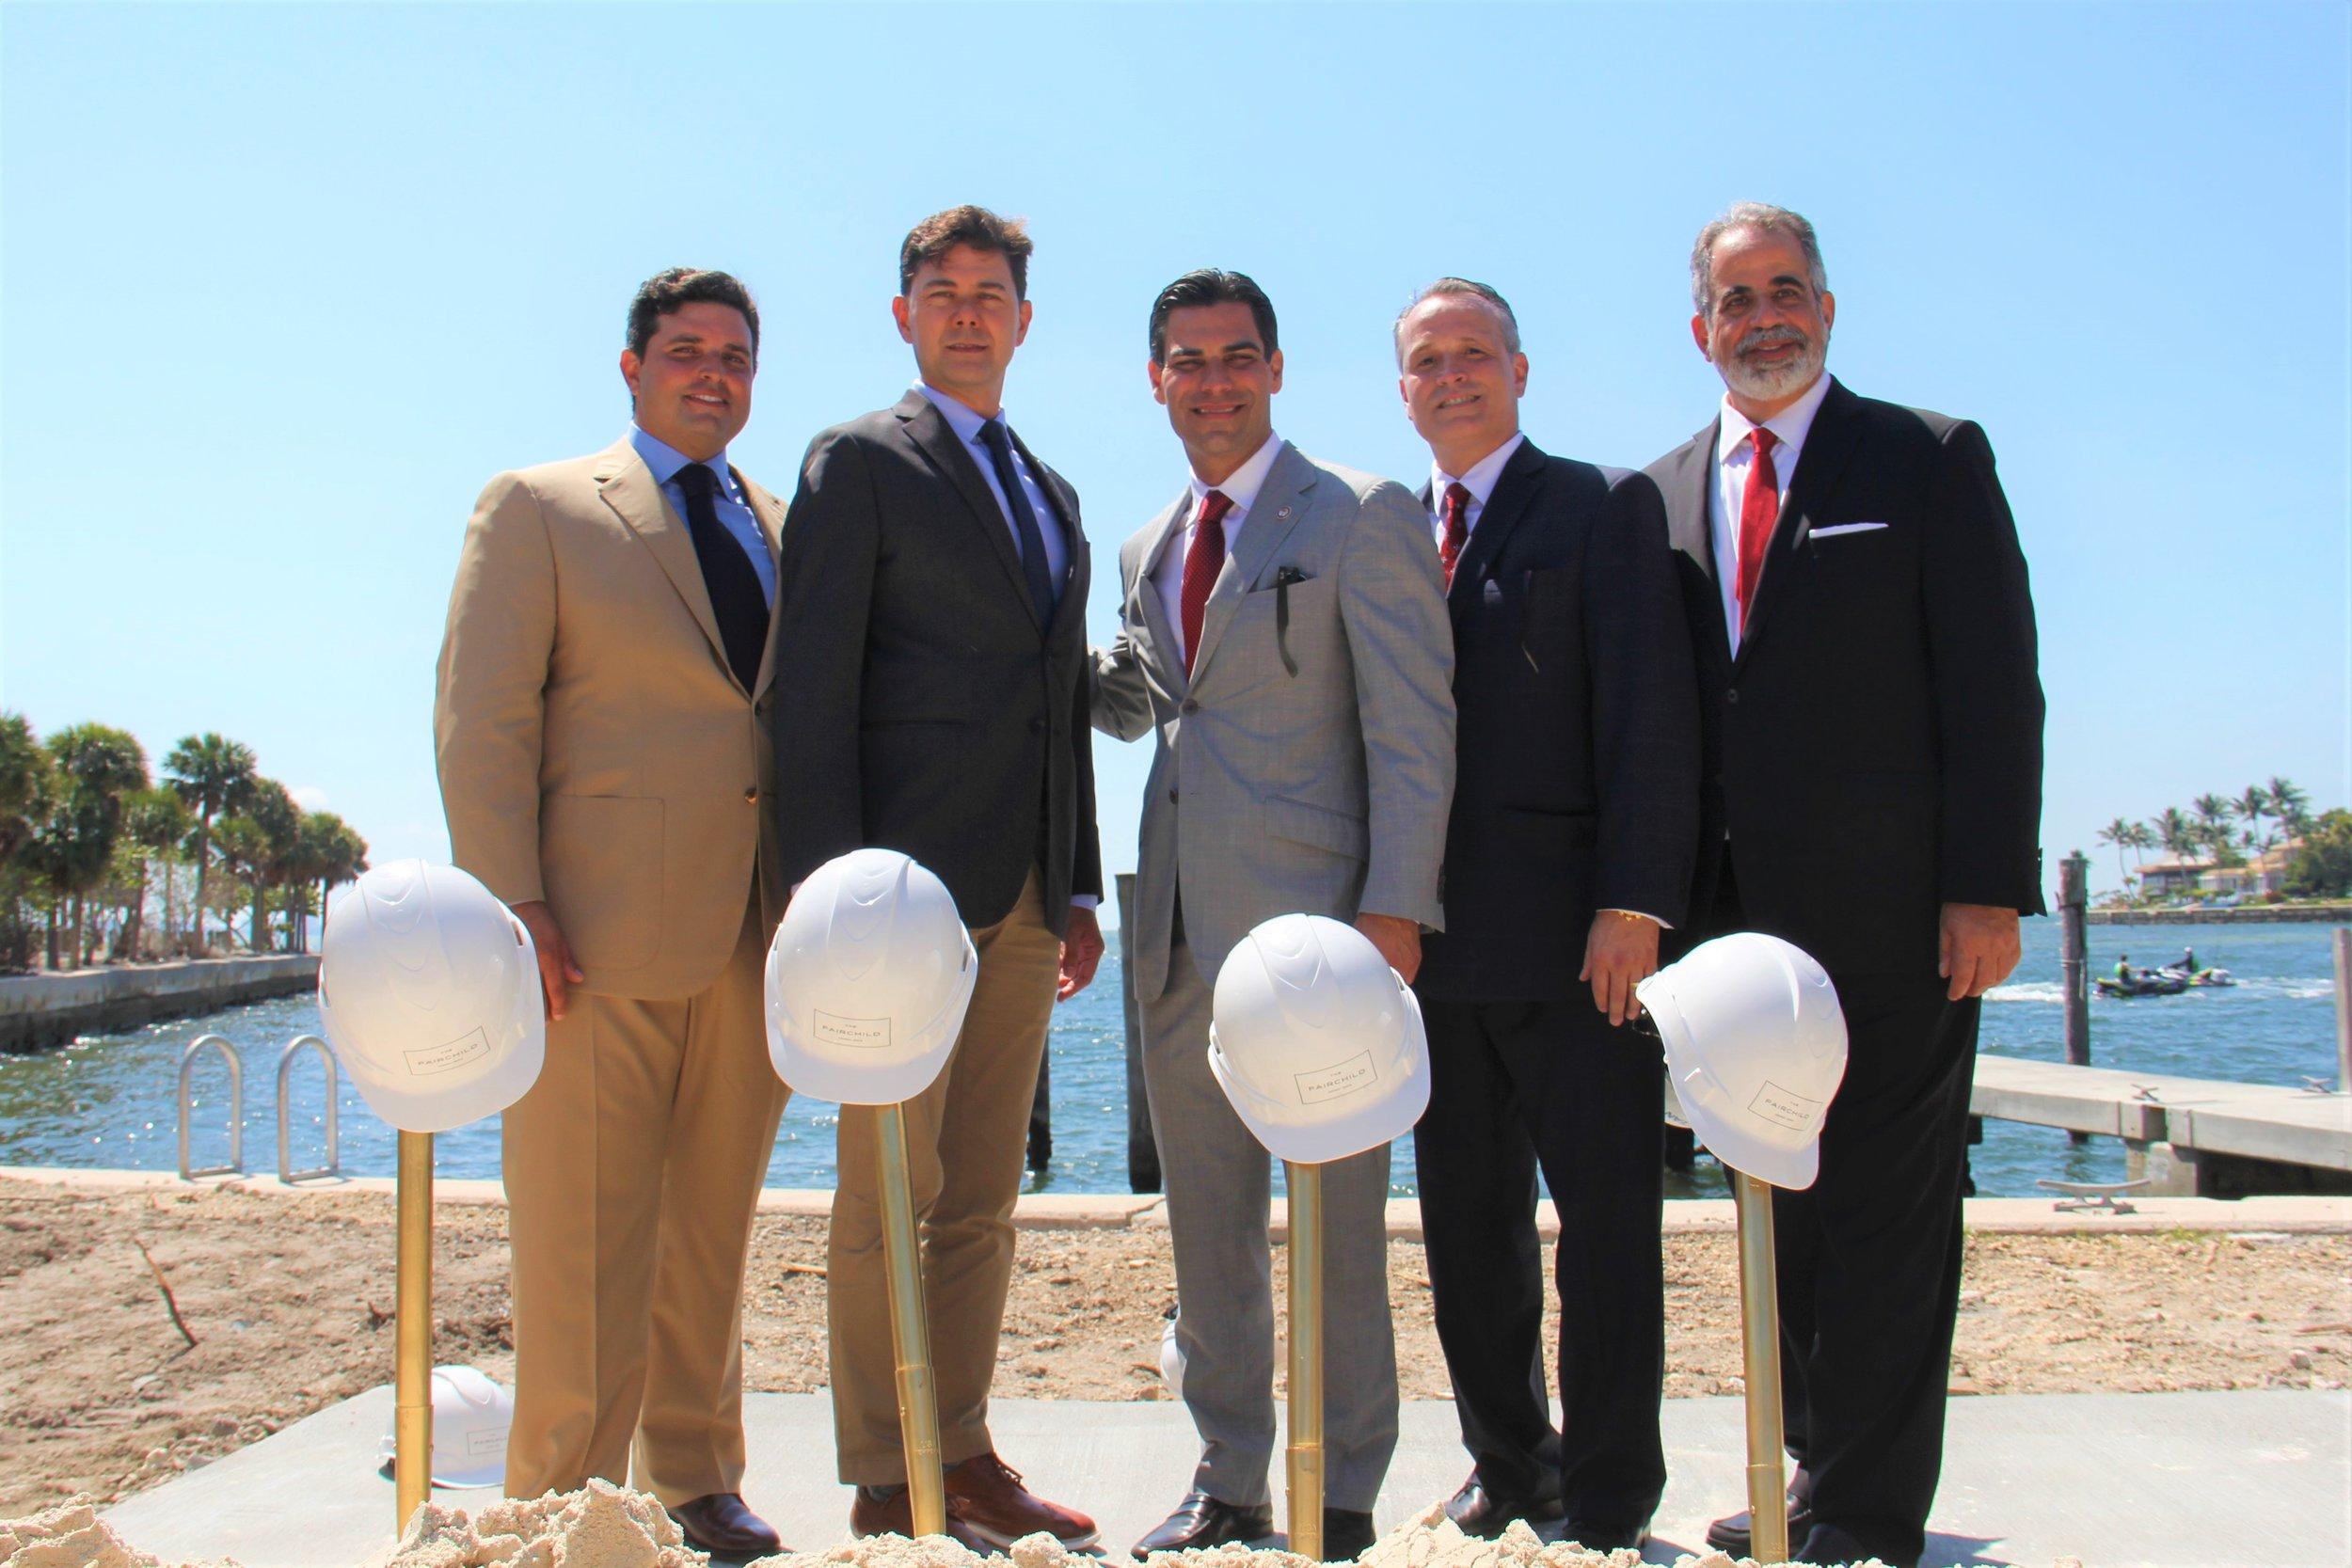 Ricardo Vadia, Commissioner Ken Russell, Mayor Francis Suarez, Oscar Rodriguez, Ralph Gonzalez Jacobo